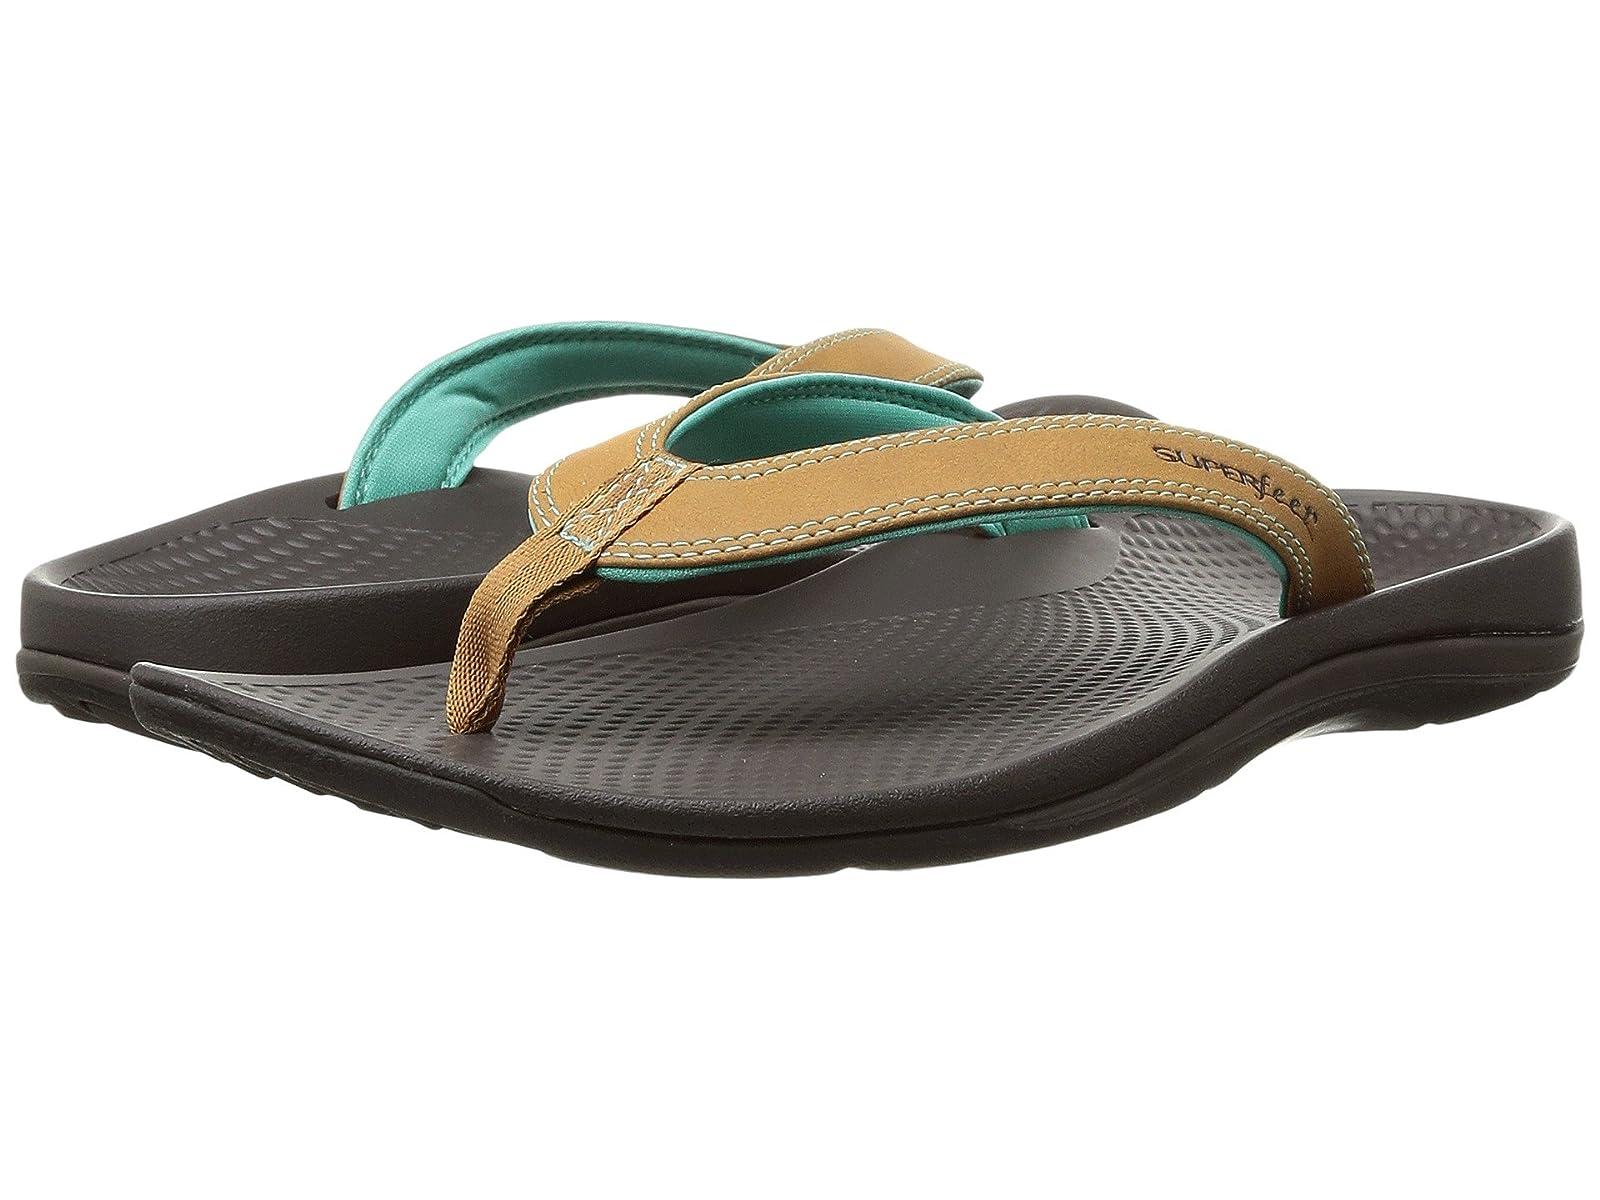 Superfeet Outside Sandal 2Atmospheric grades have affordable shoes